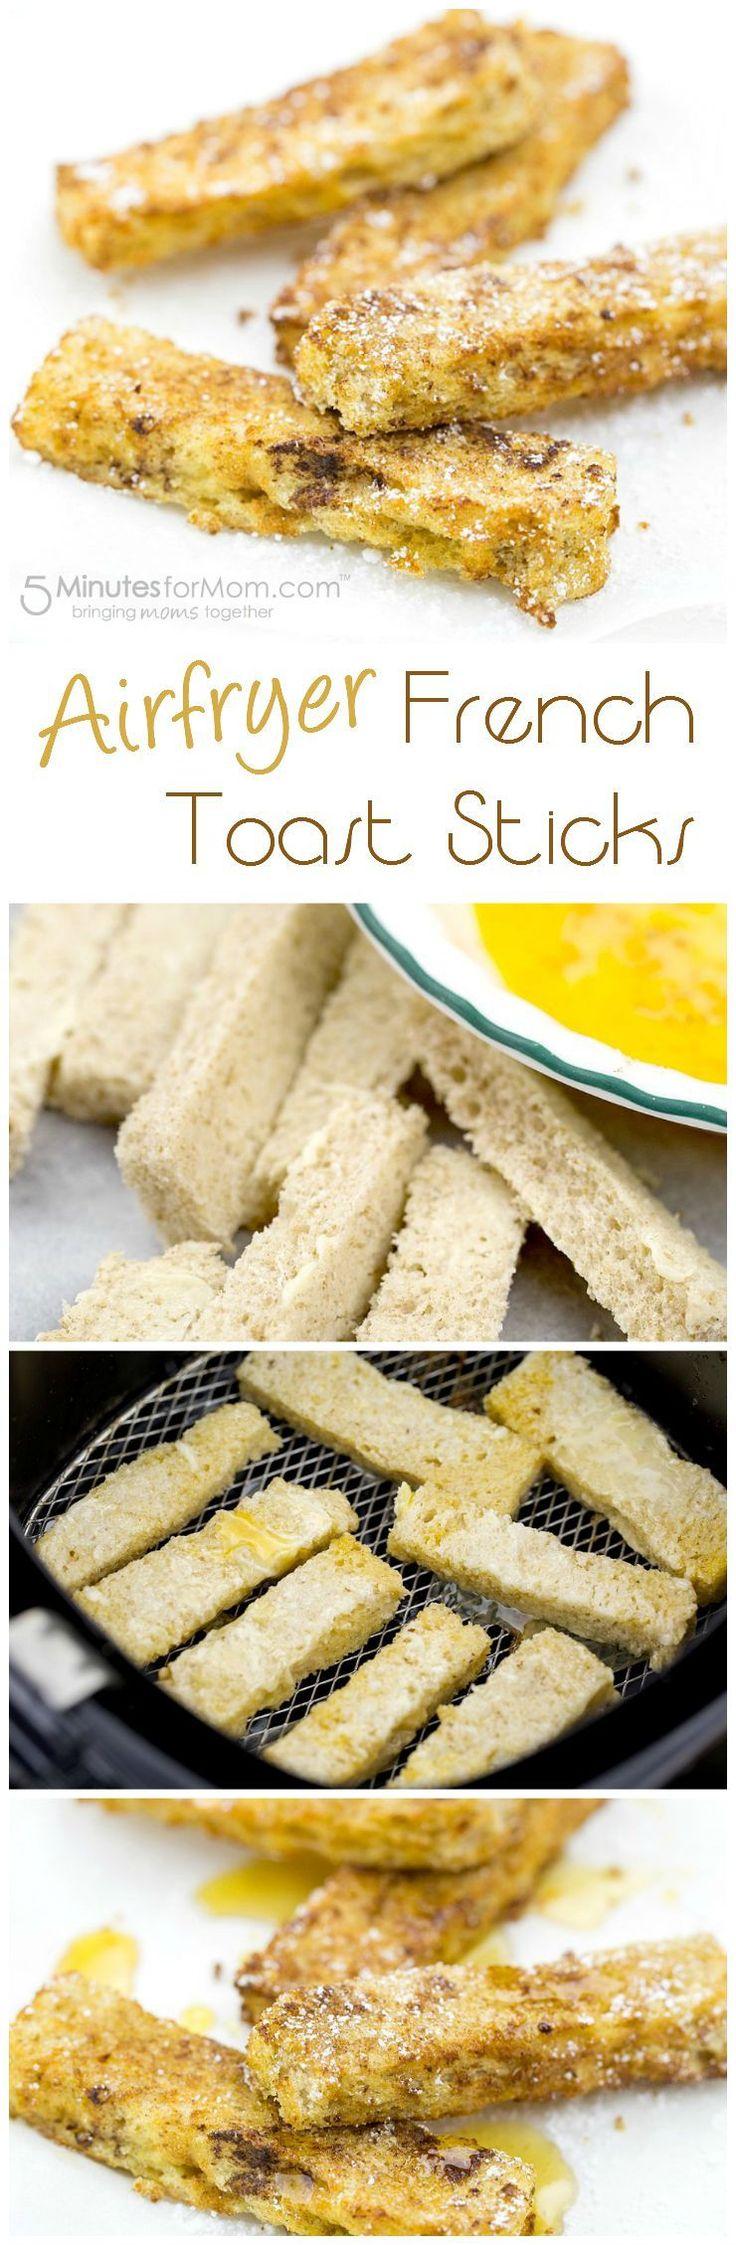 Airfryer French Toast Sticks Recipe